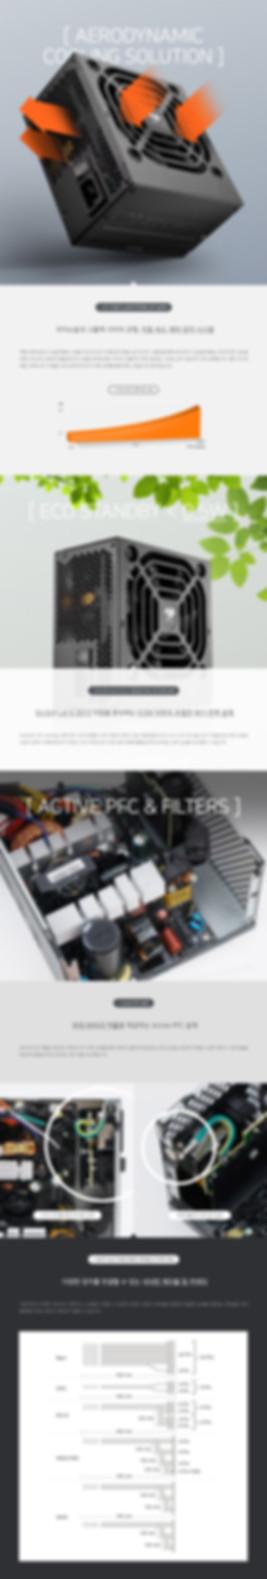 STX650_3_5322.jpg